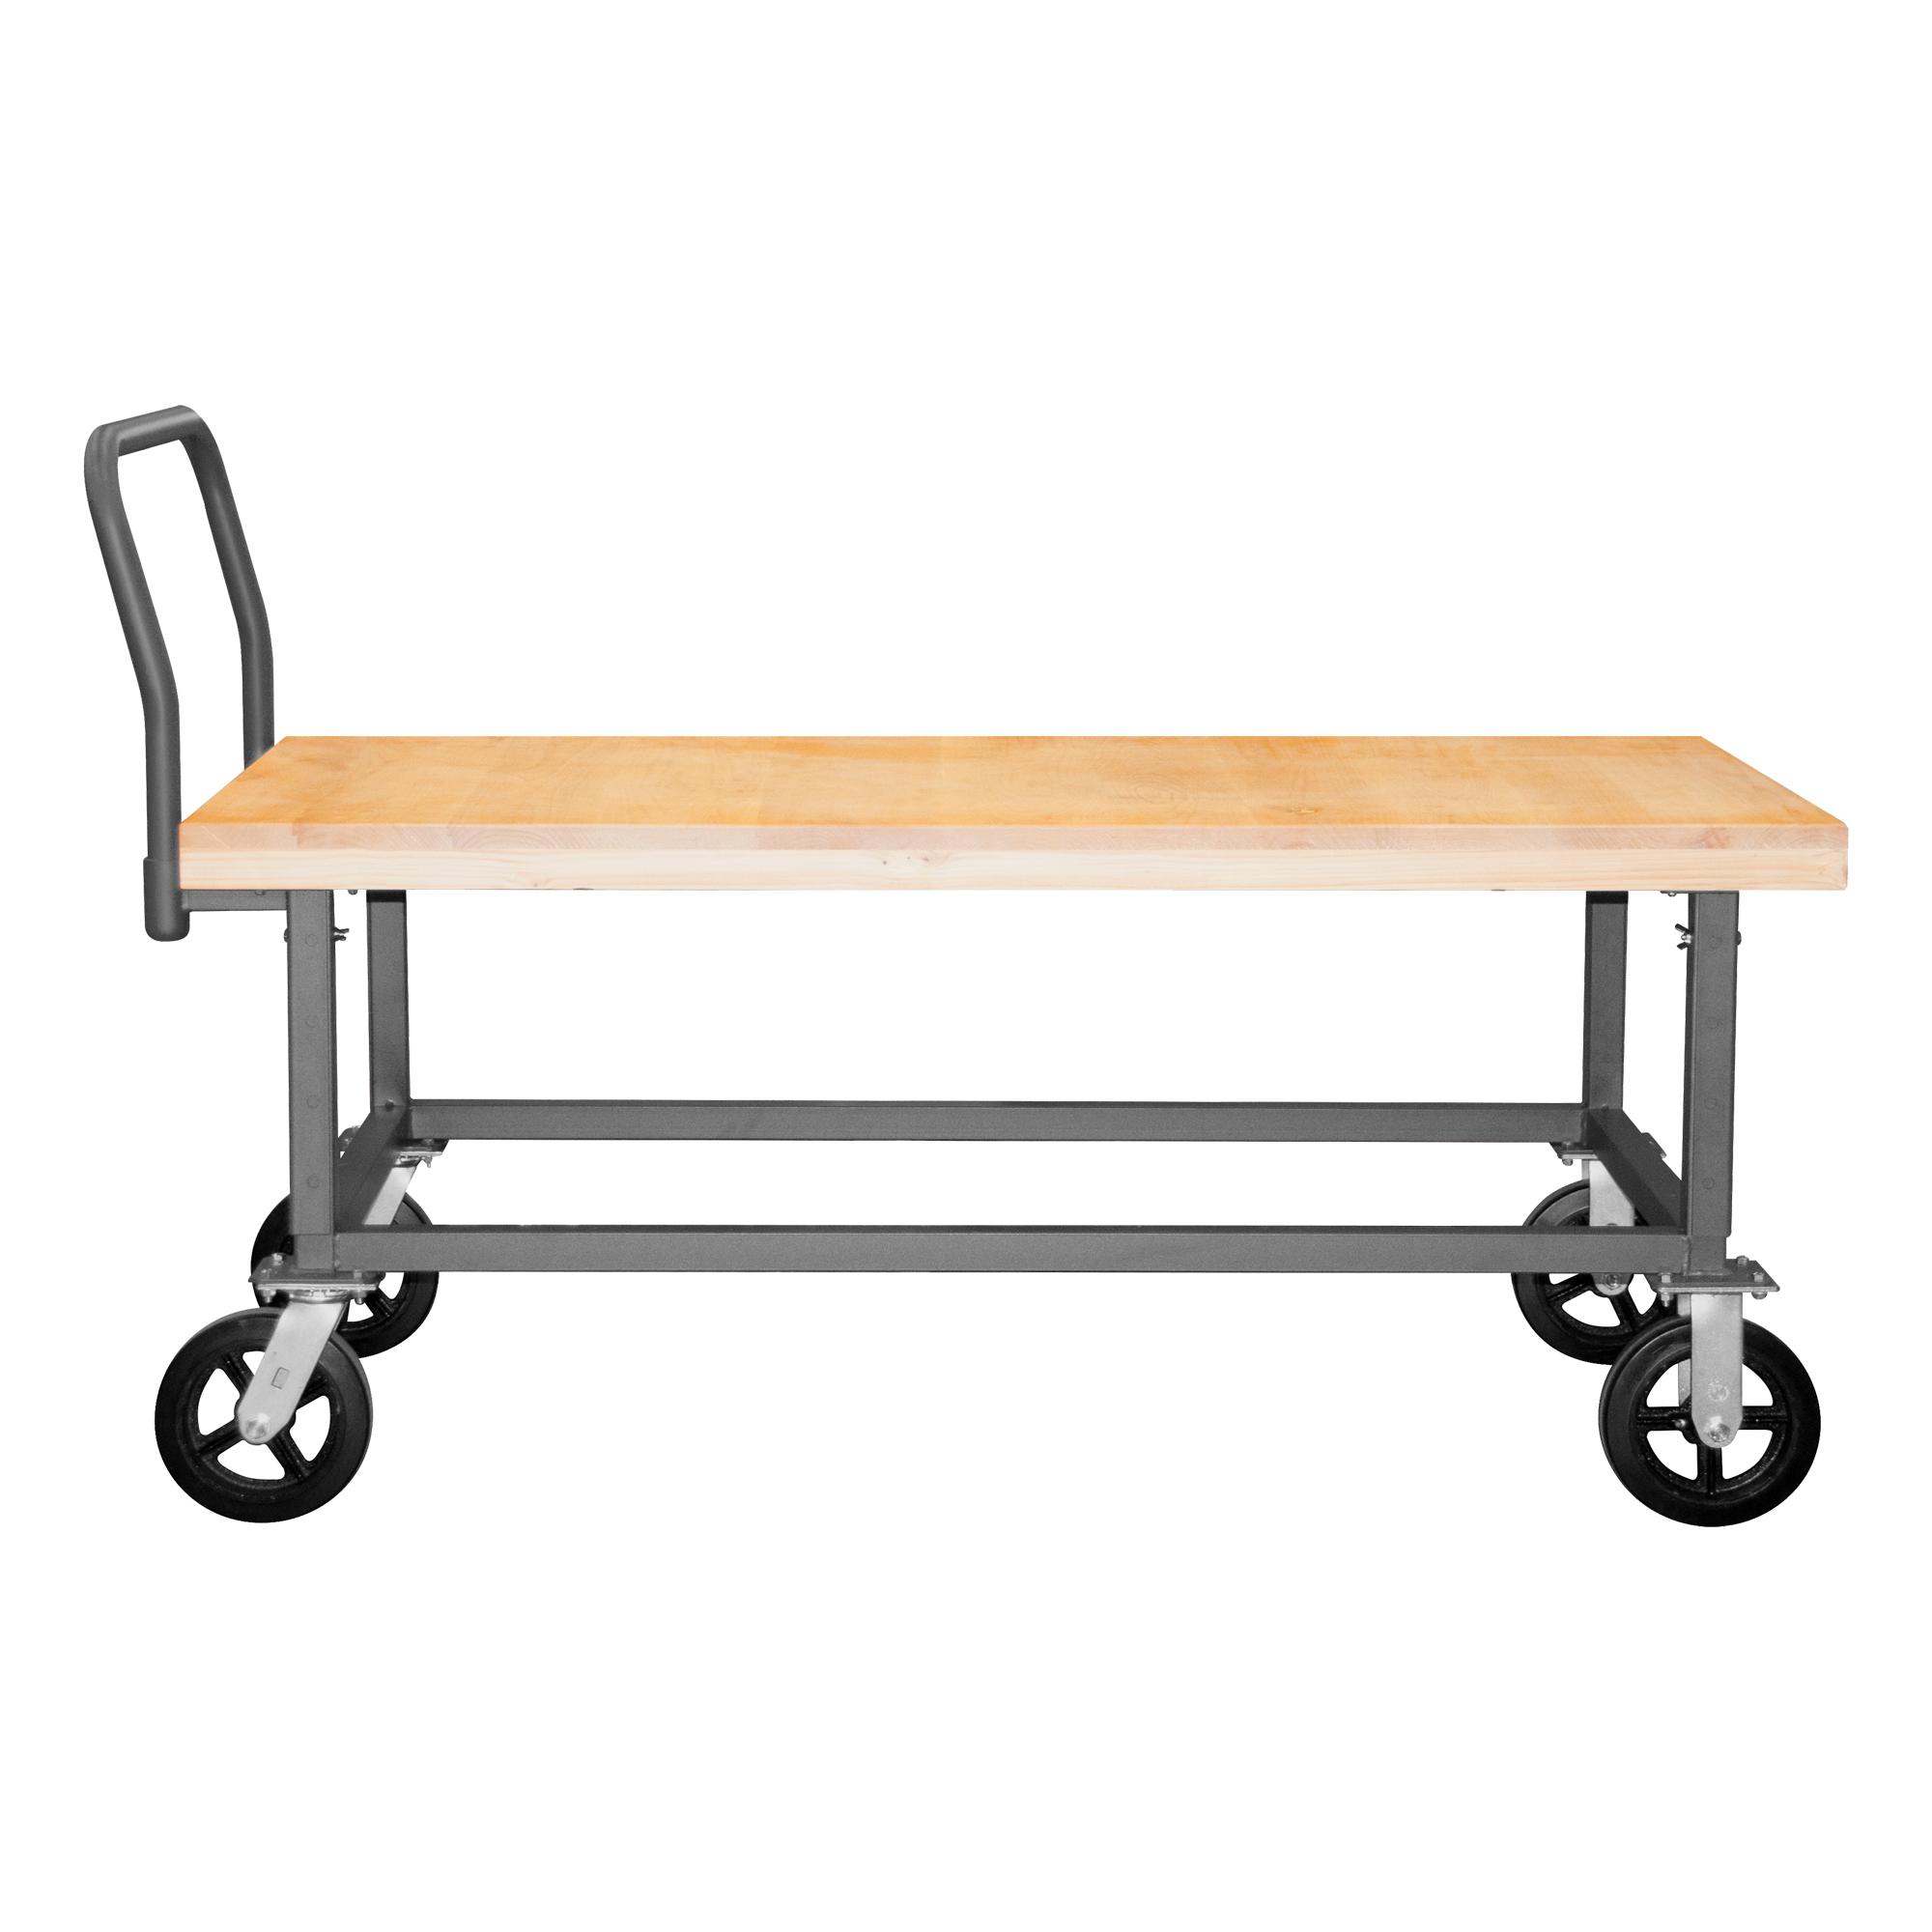 Platform Truck Adjustable Height Wood Deck 1800 Lbs Capacity 24 X 48 Durham Manufacturing